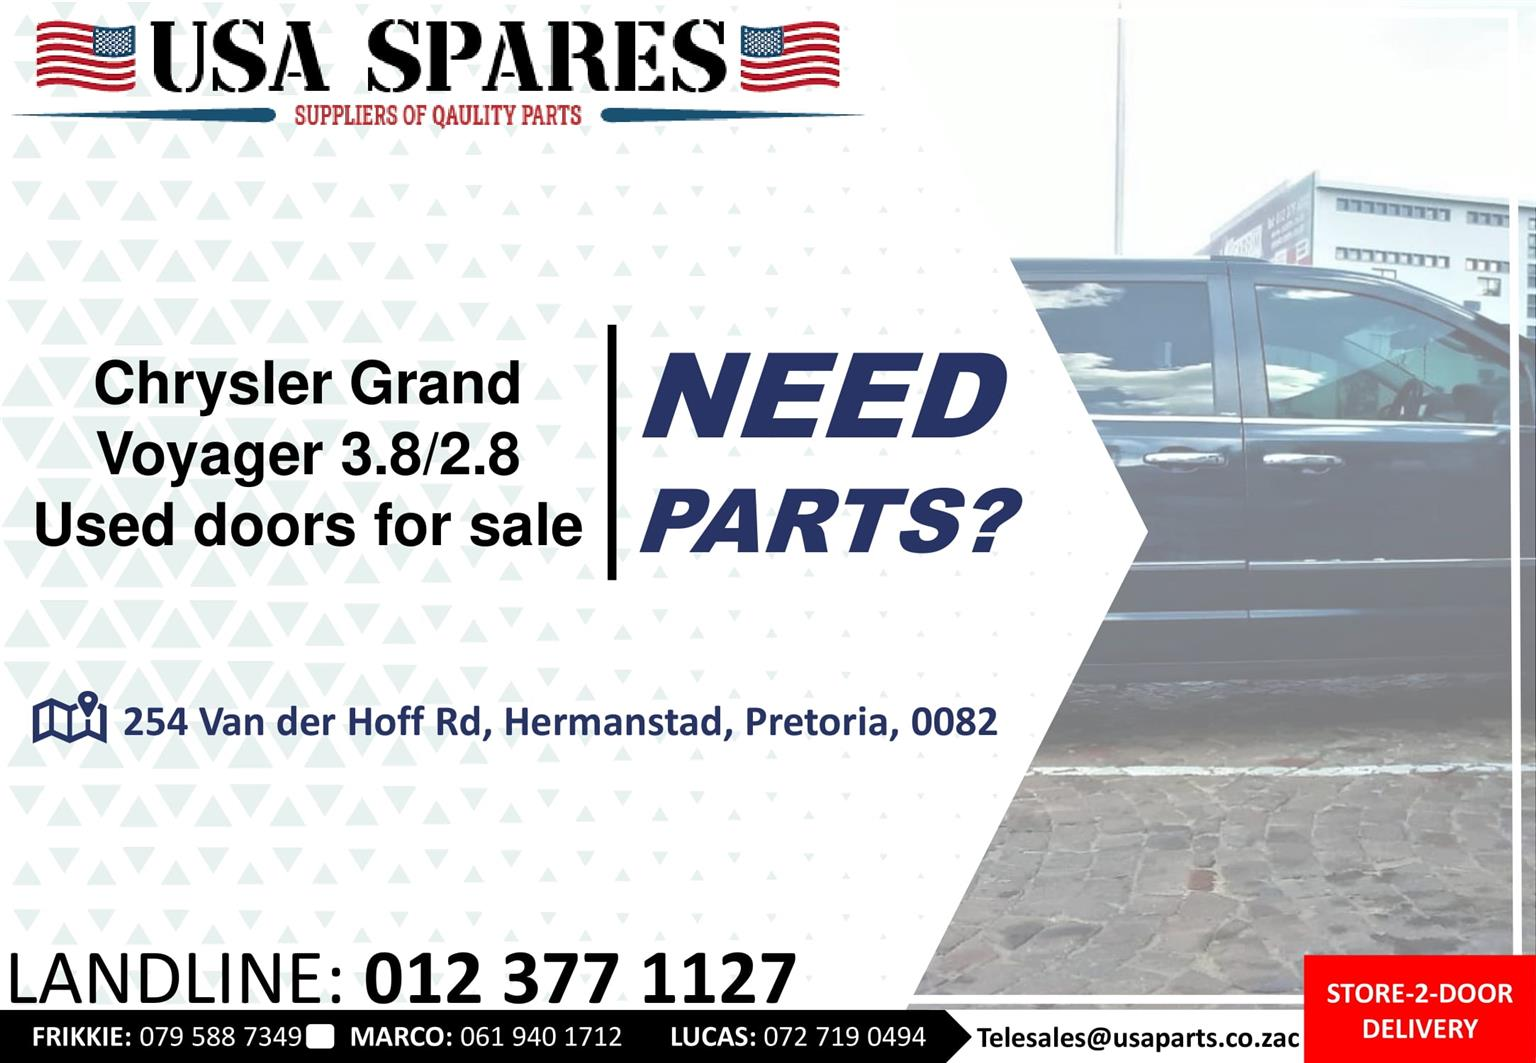 Chrysler Grand Voyager 2.8/3.8 MK3 used doors for sale